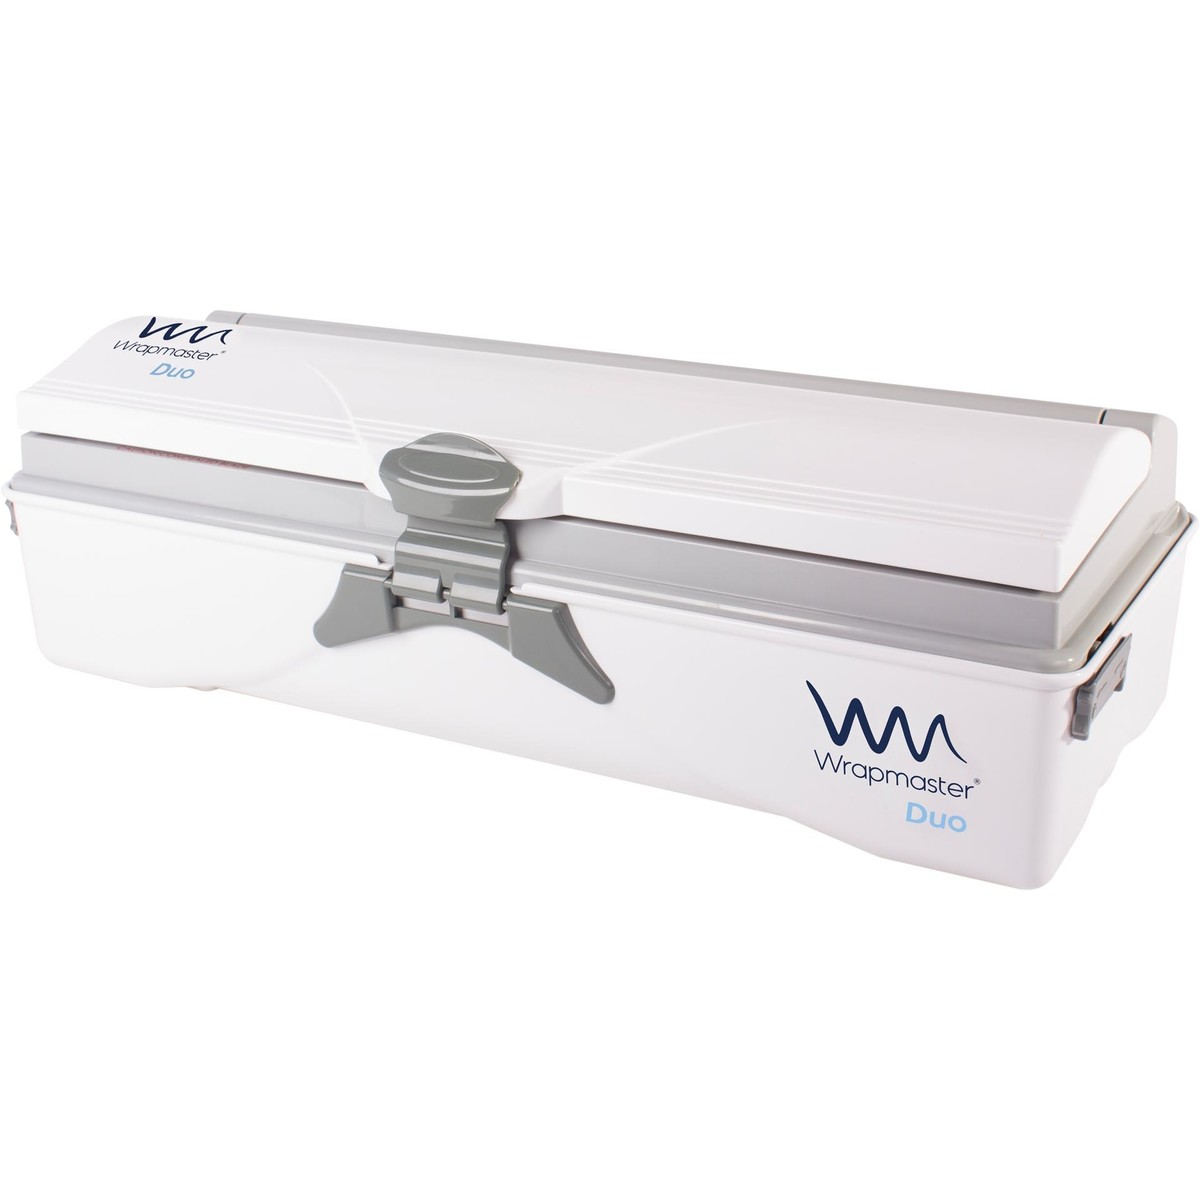 Folienspender Wrapmaster Duo